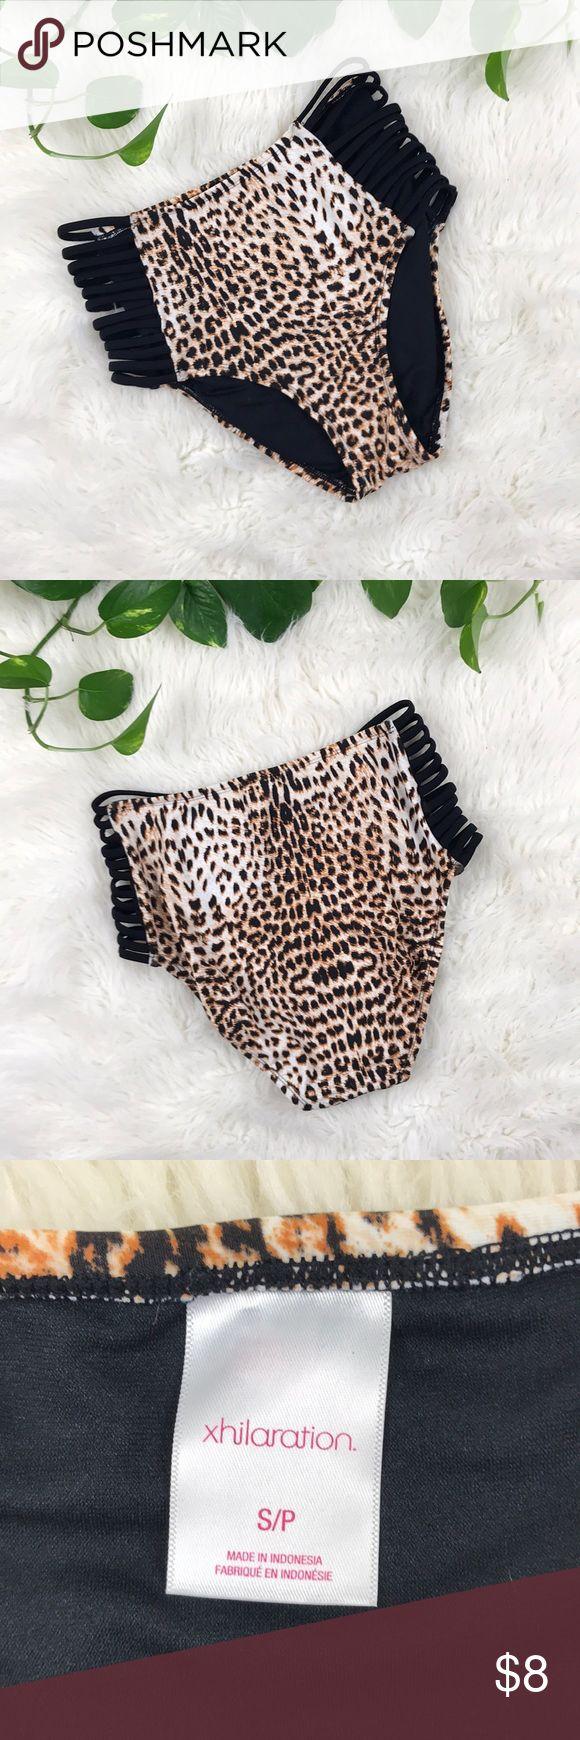 High rise swimsuit bottoms Never worn high rise animal print bikini bottoms with strappy cut out sides. Xhilaration Swim Bikinis